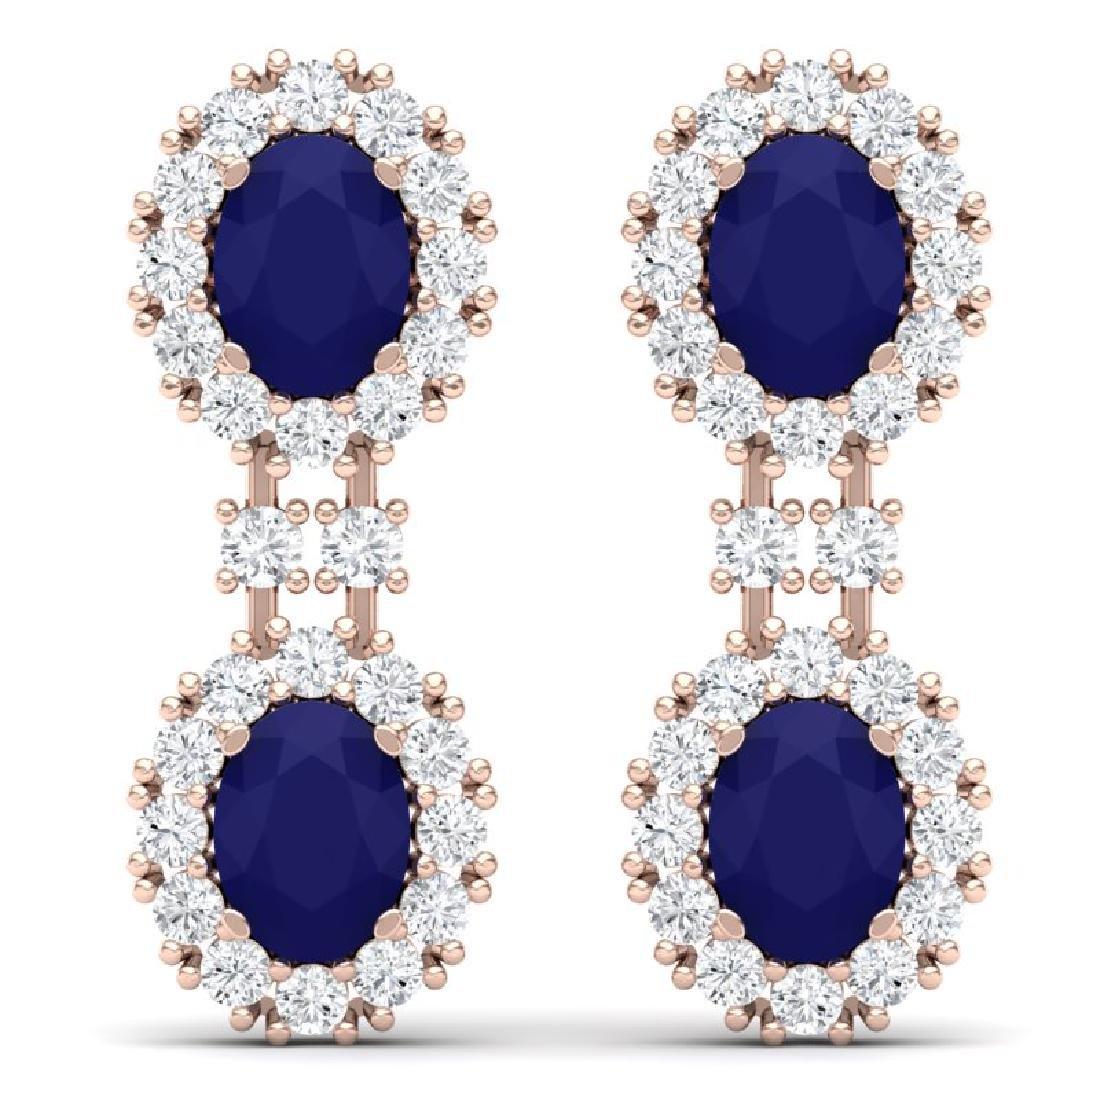 8.98 CTW Royalty Sapphire & VS Diamond Earrings 18K